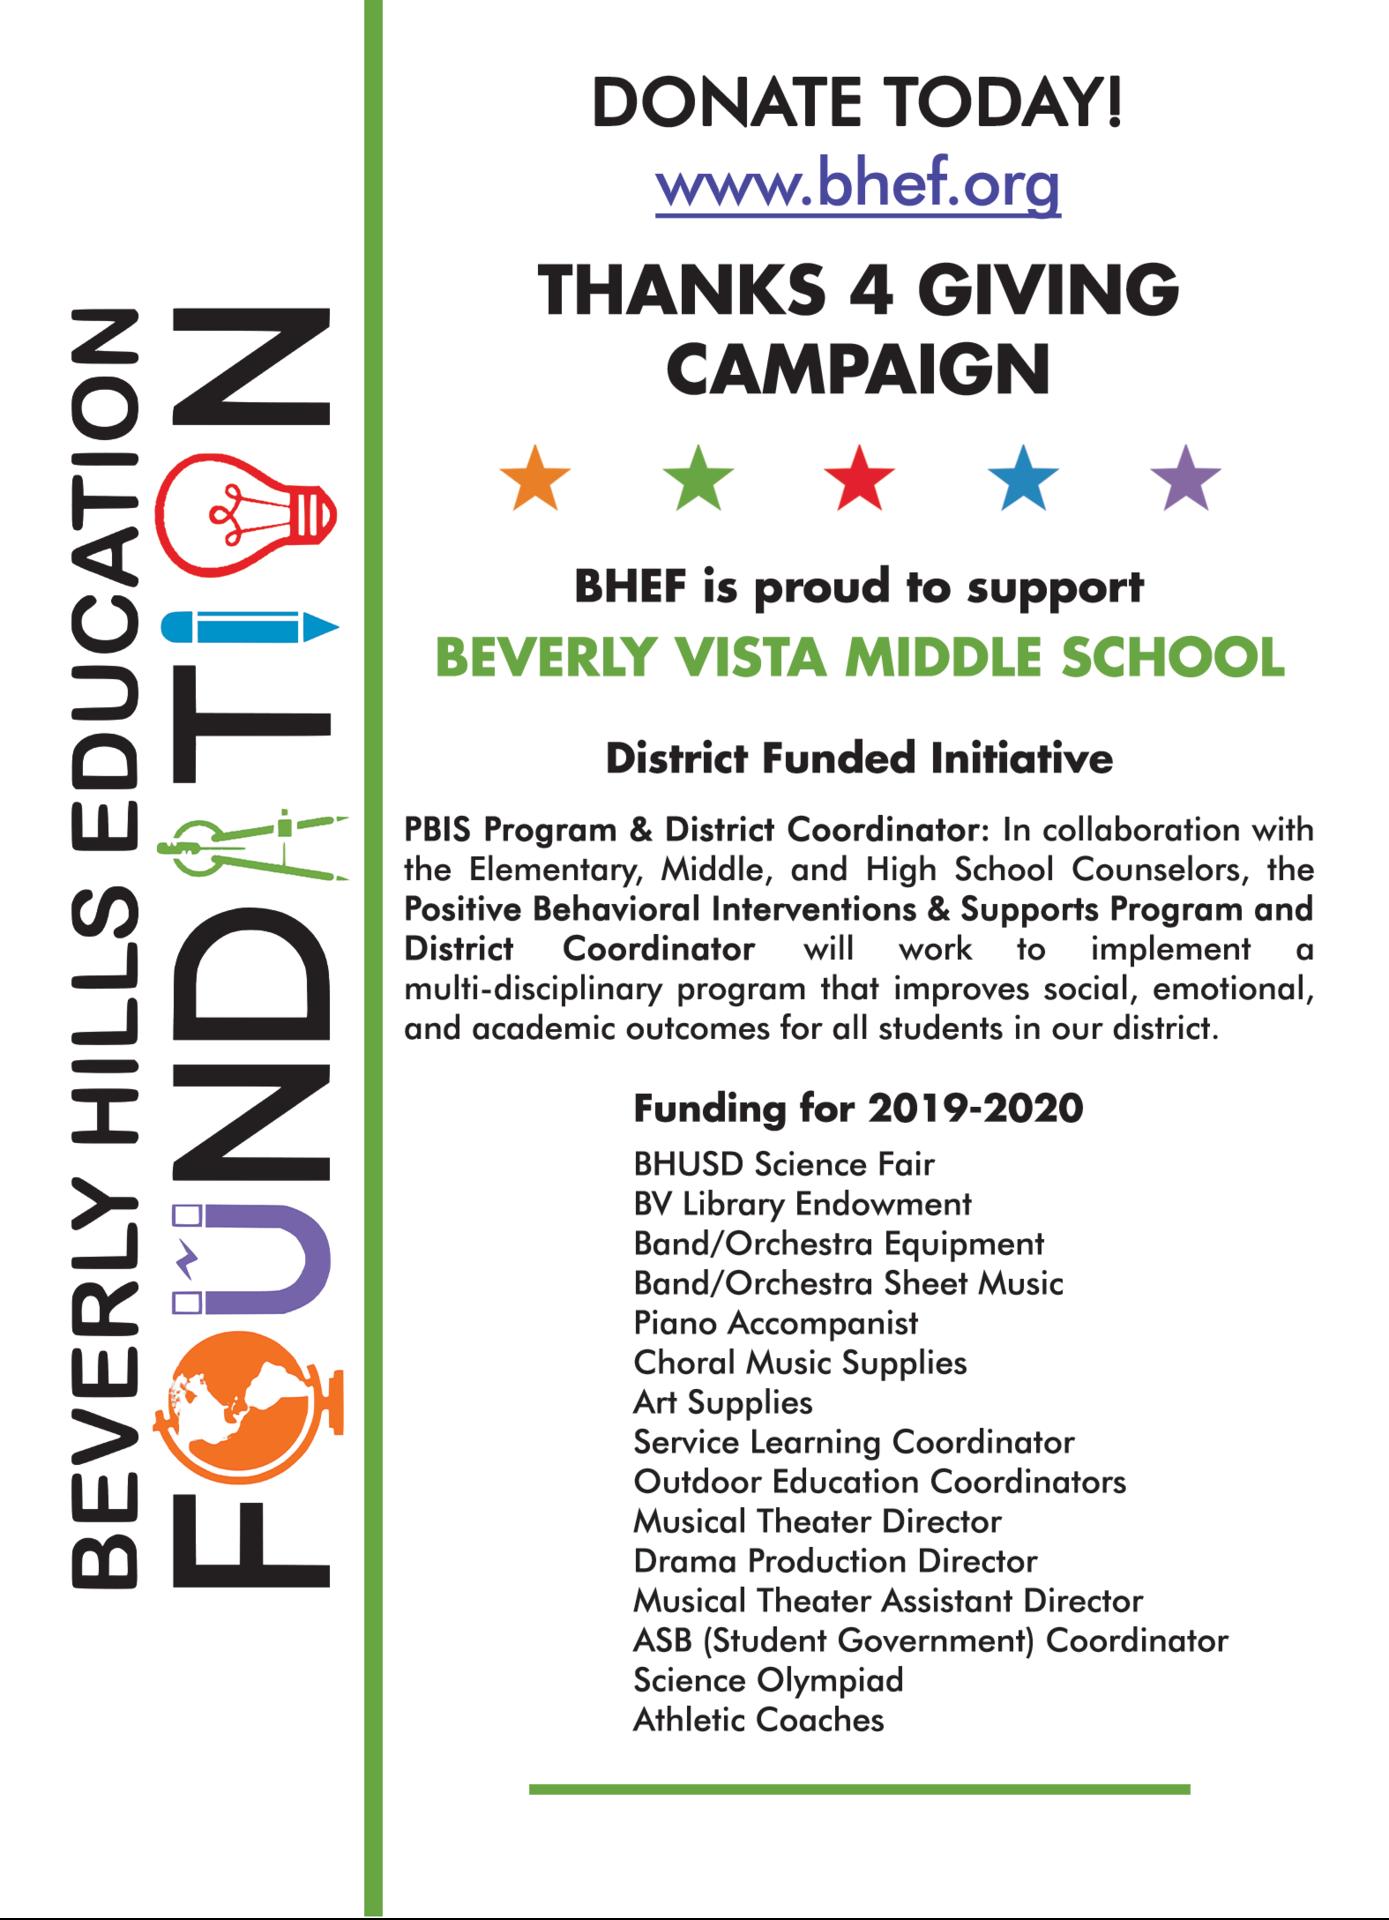 bv funded programs 2019